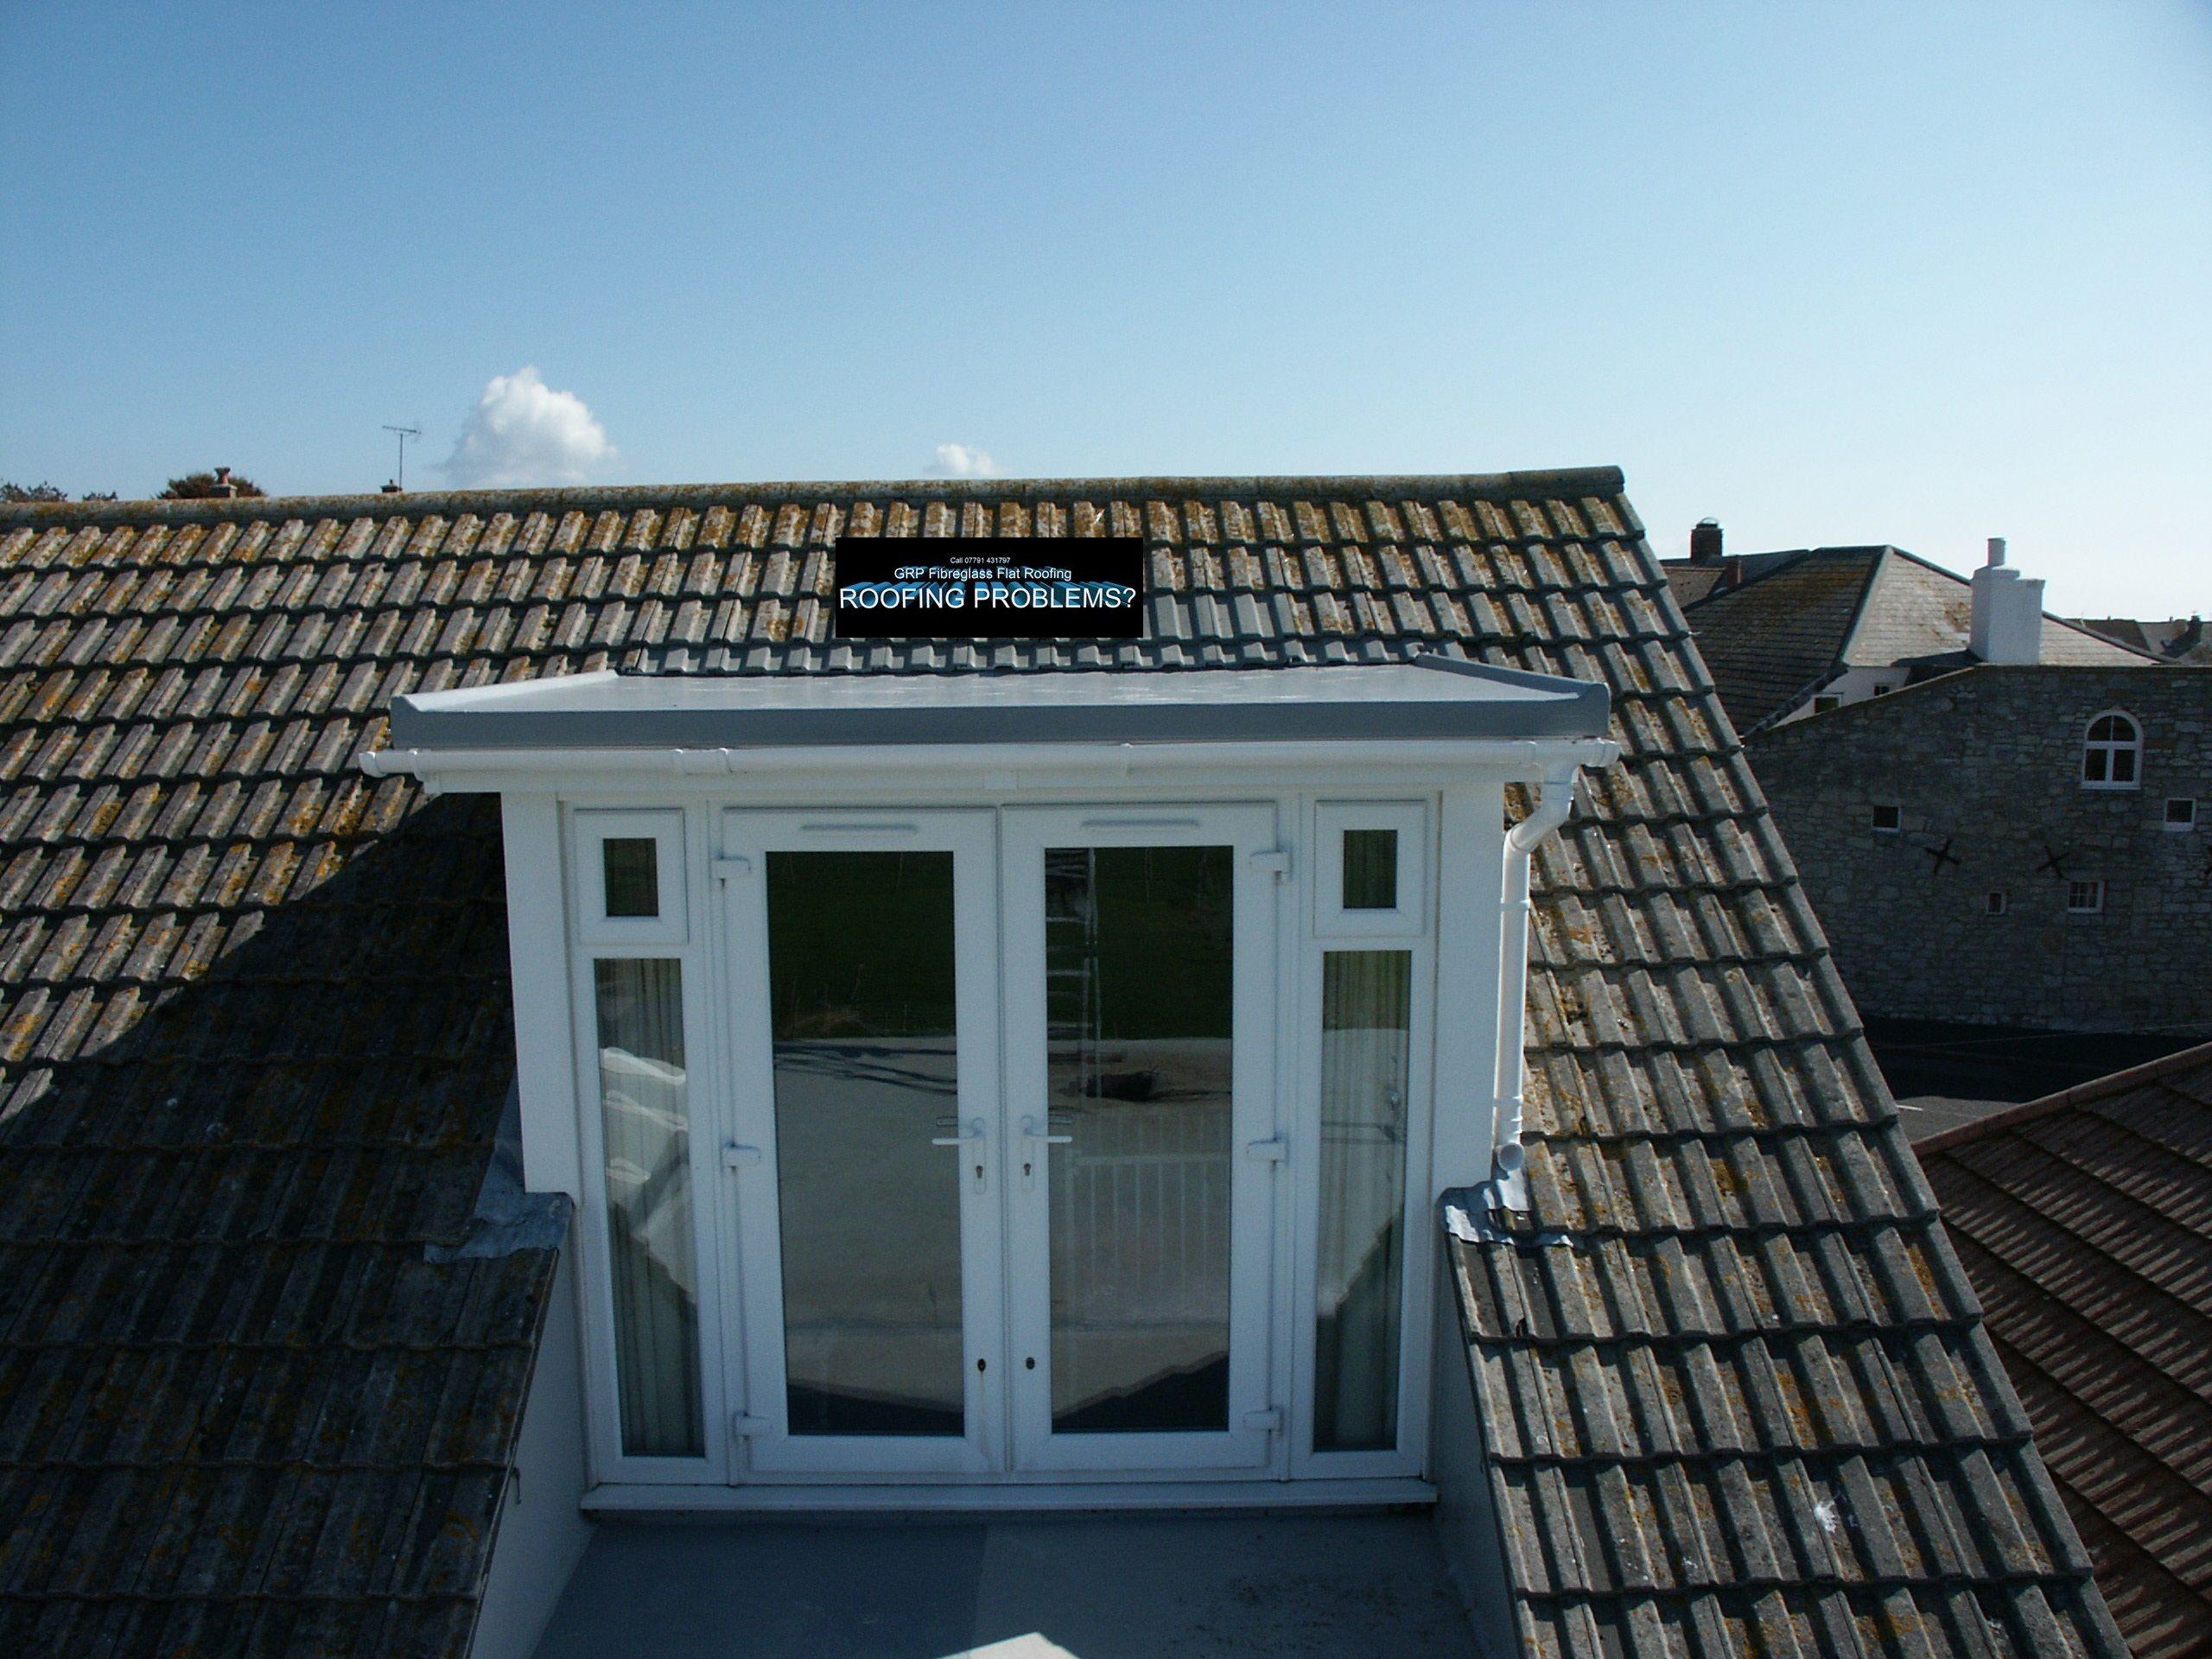 dormer window with balcony - Google Search & dormer window with balcony - Google Search | Ideas for the House ...